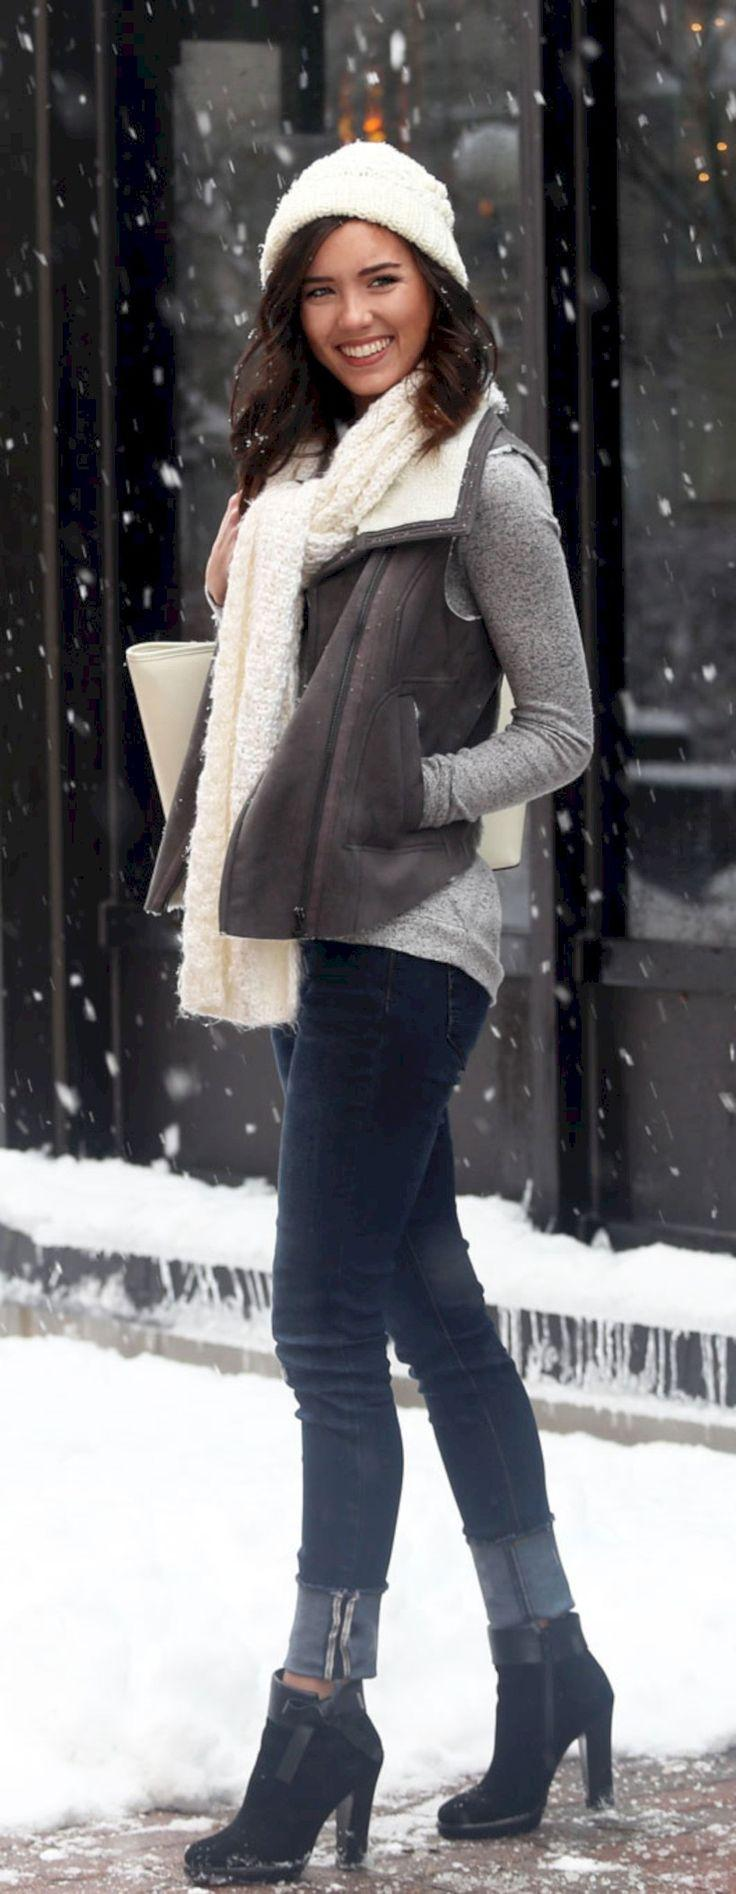 Wedding - 45 Comfy Winter Fashion For Women In 2017